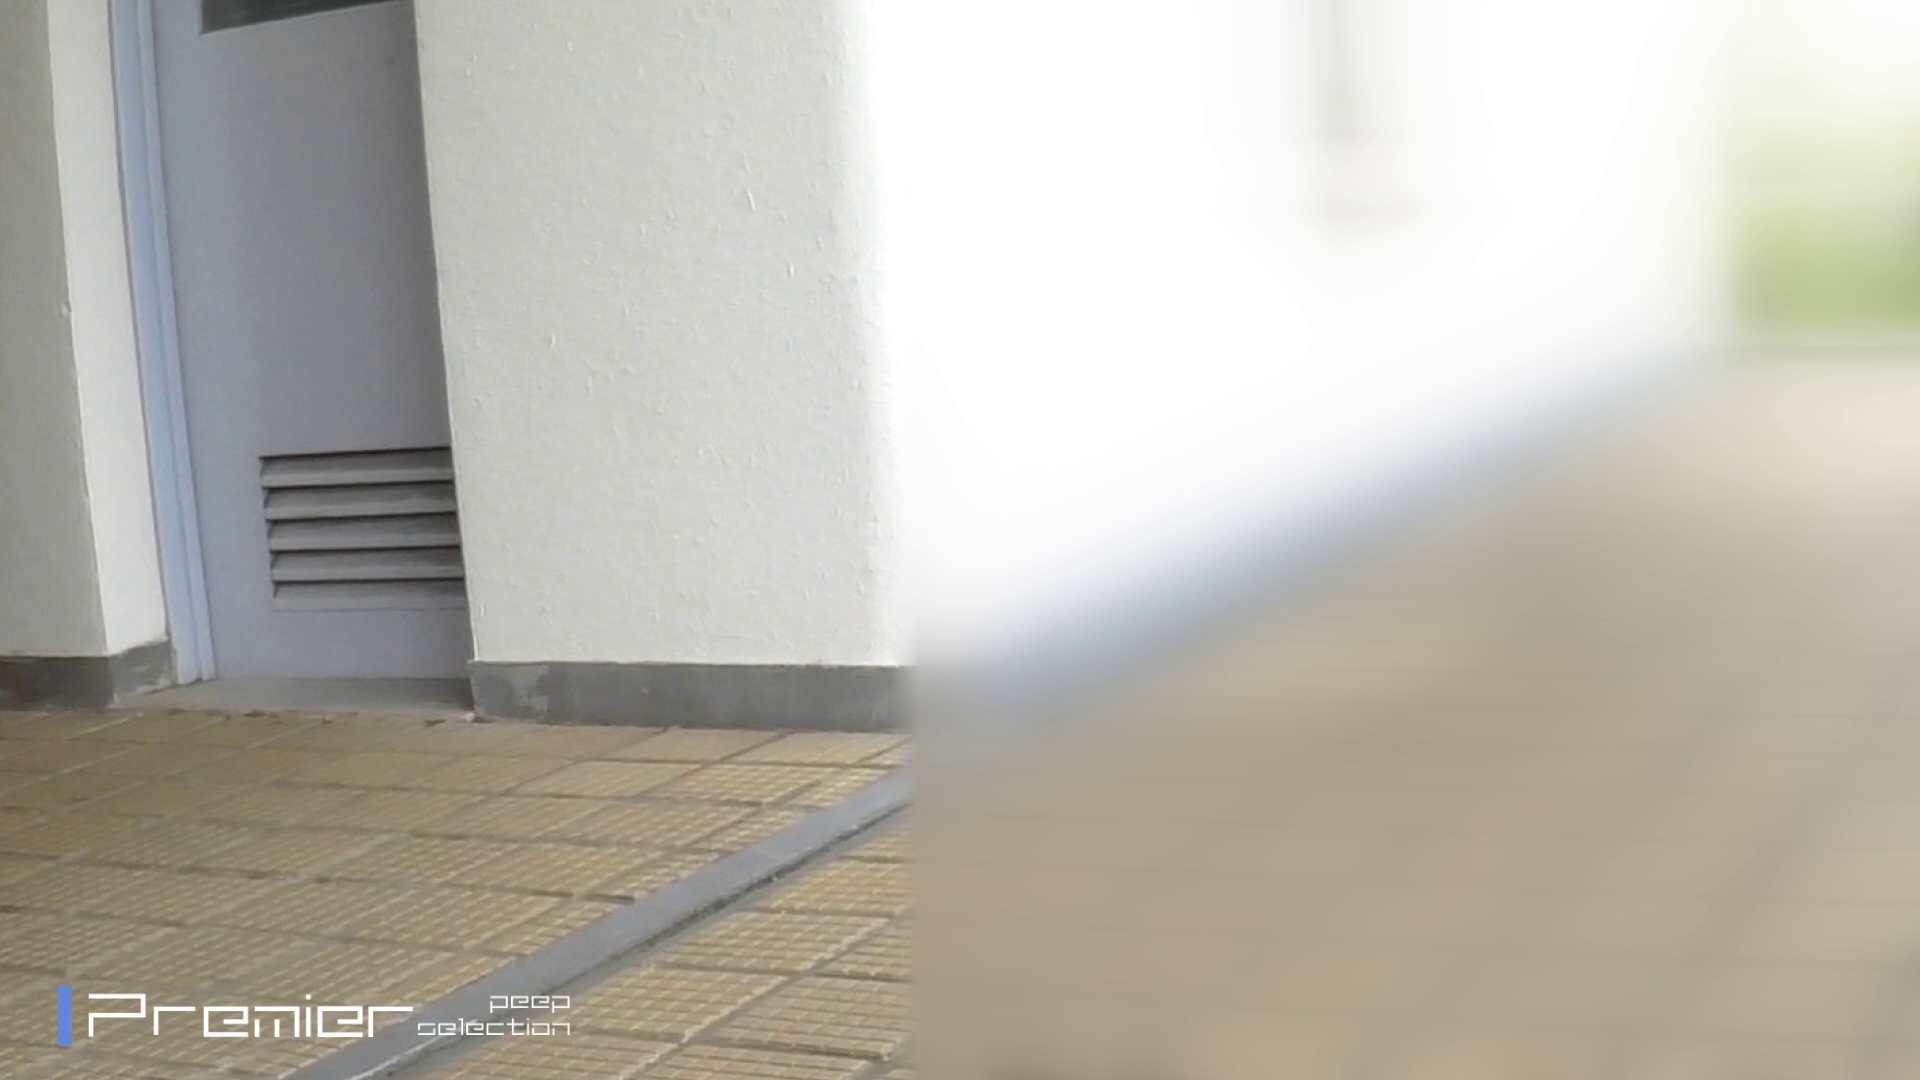 FHD激カワ!激やば! 復讐のトイレ盗撮 Vol.03 名作殿堂  78PIX 28